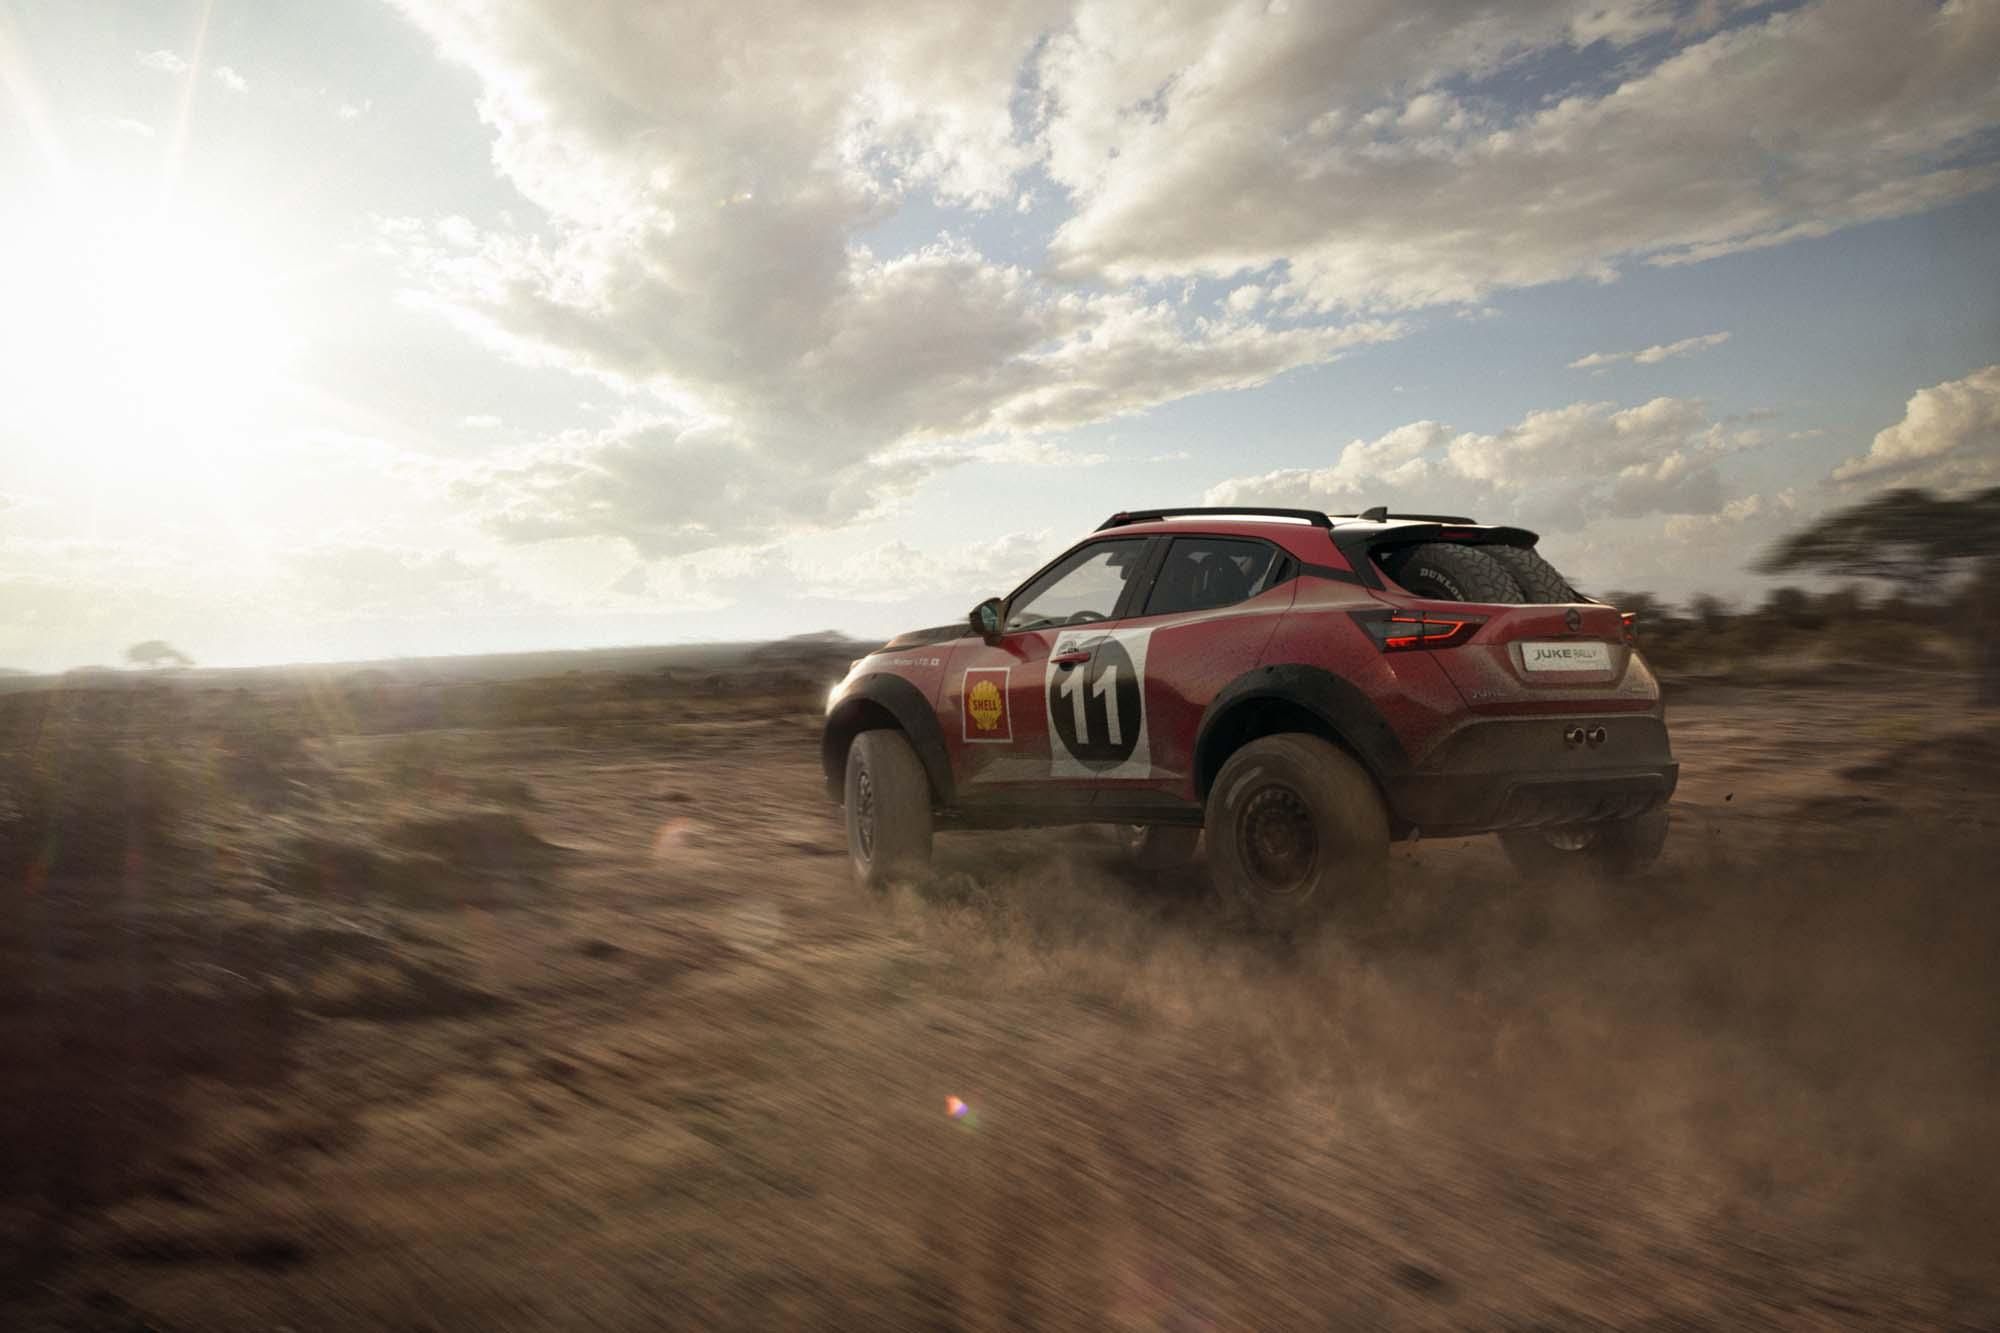 JUKE Rally Heritage Concept 6 Πώς σου φαίνεται αυτό το Nissan Juke Rally; Nissan, Nissan Juke, zblog, ειδήσεις, Νέα